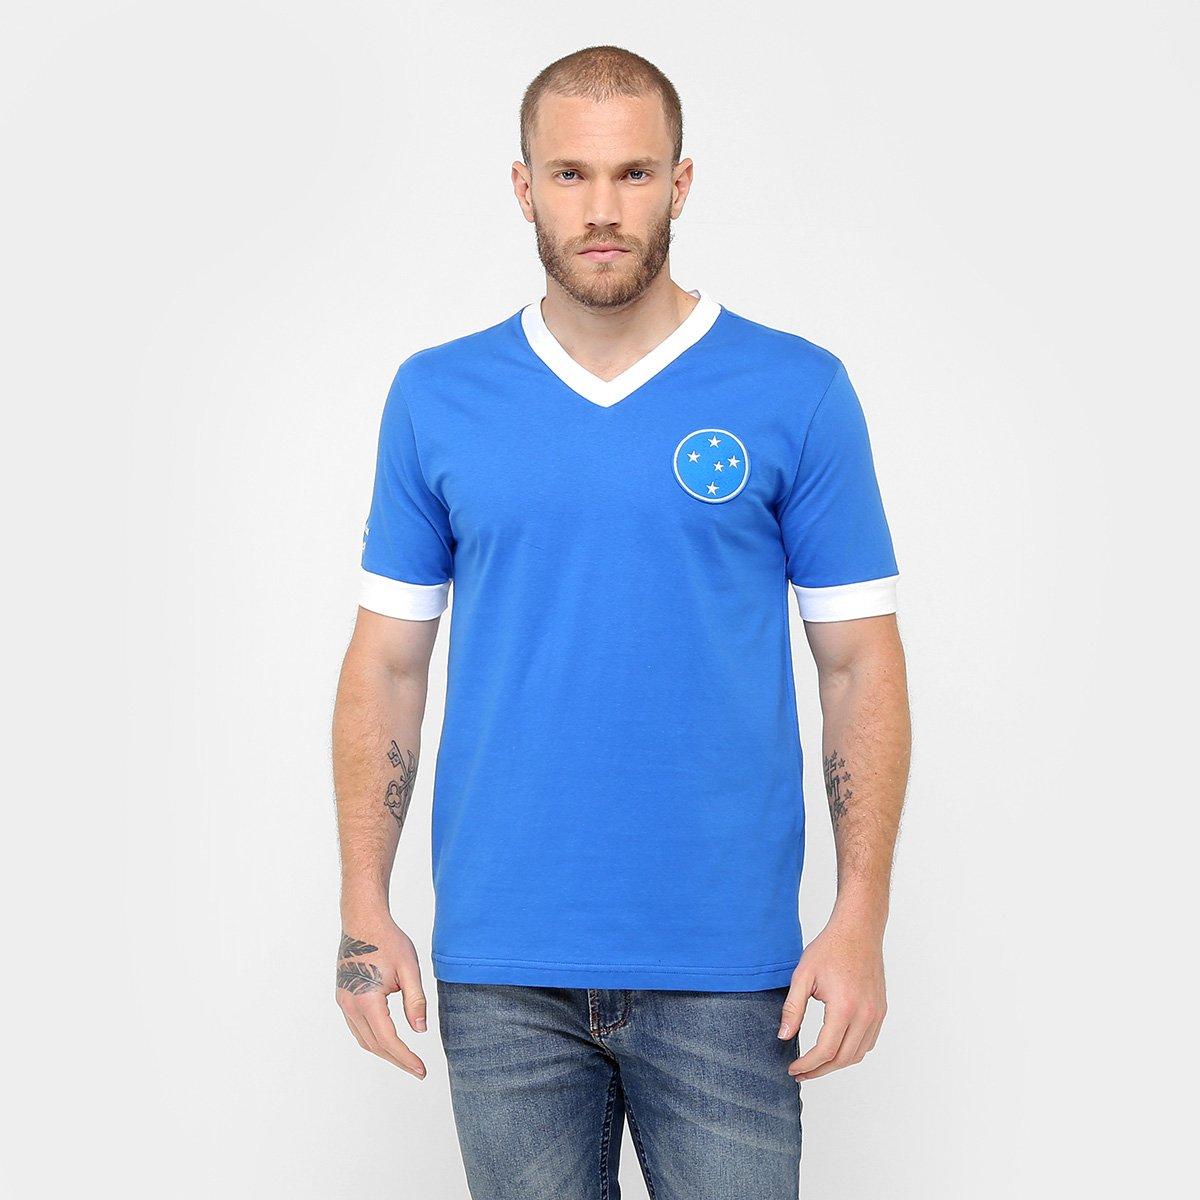 Camisa Cruzeiro retro 1949 1910 NATURAL